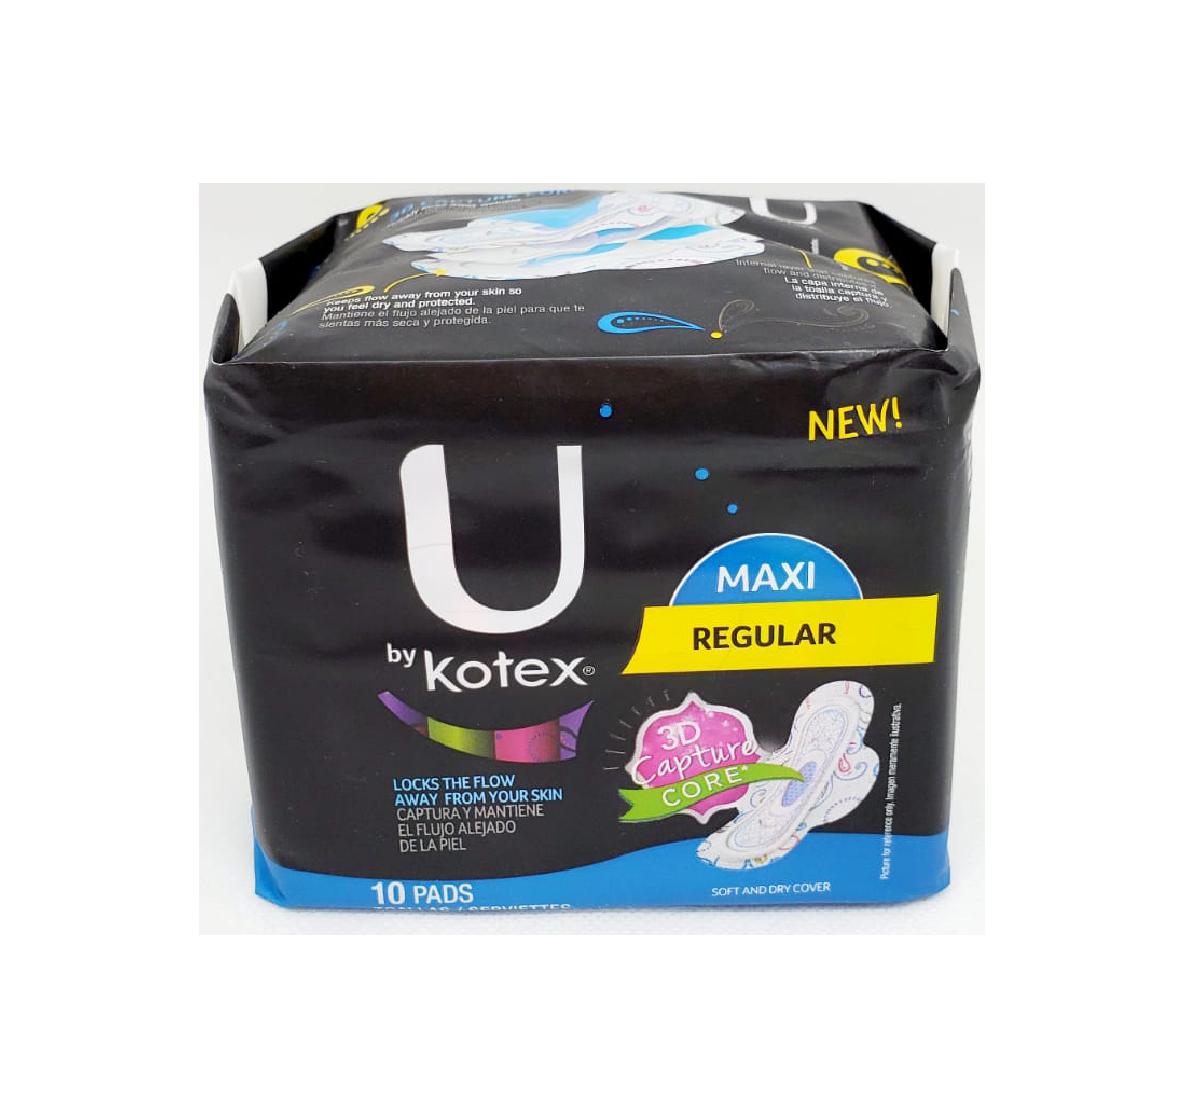 Toalla Sanitaria U by Kotex MAXI Regular